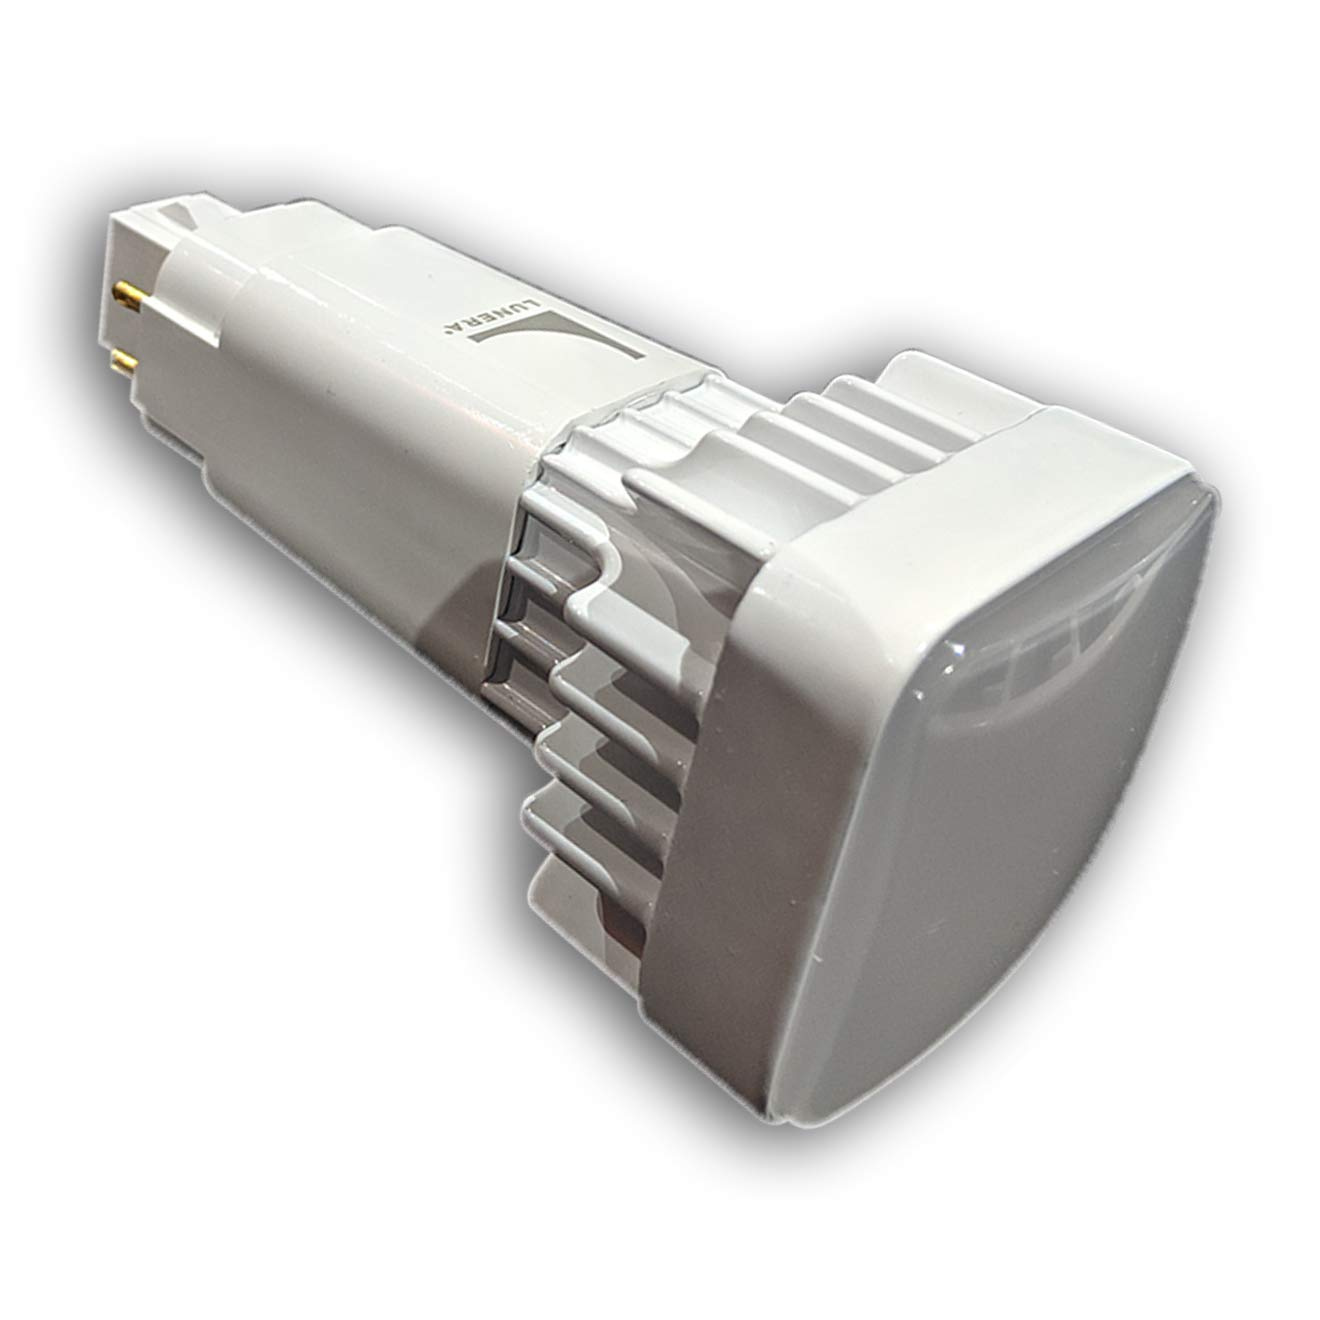 Lunera G24q 4 Pin Vertical Cfl Led Dimmable Light Bulb  11w  1350 Lumen  Ballast Driven  4th